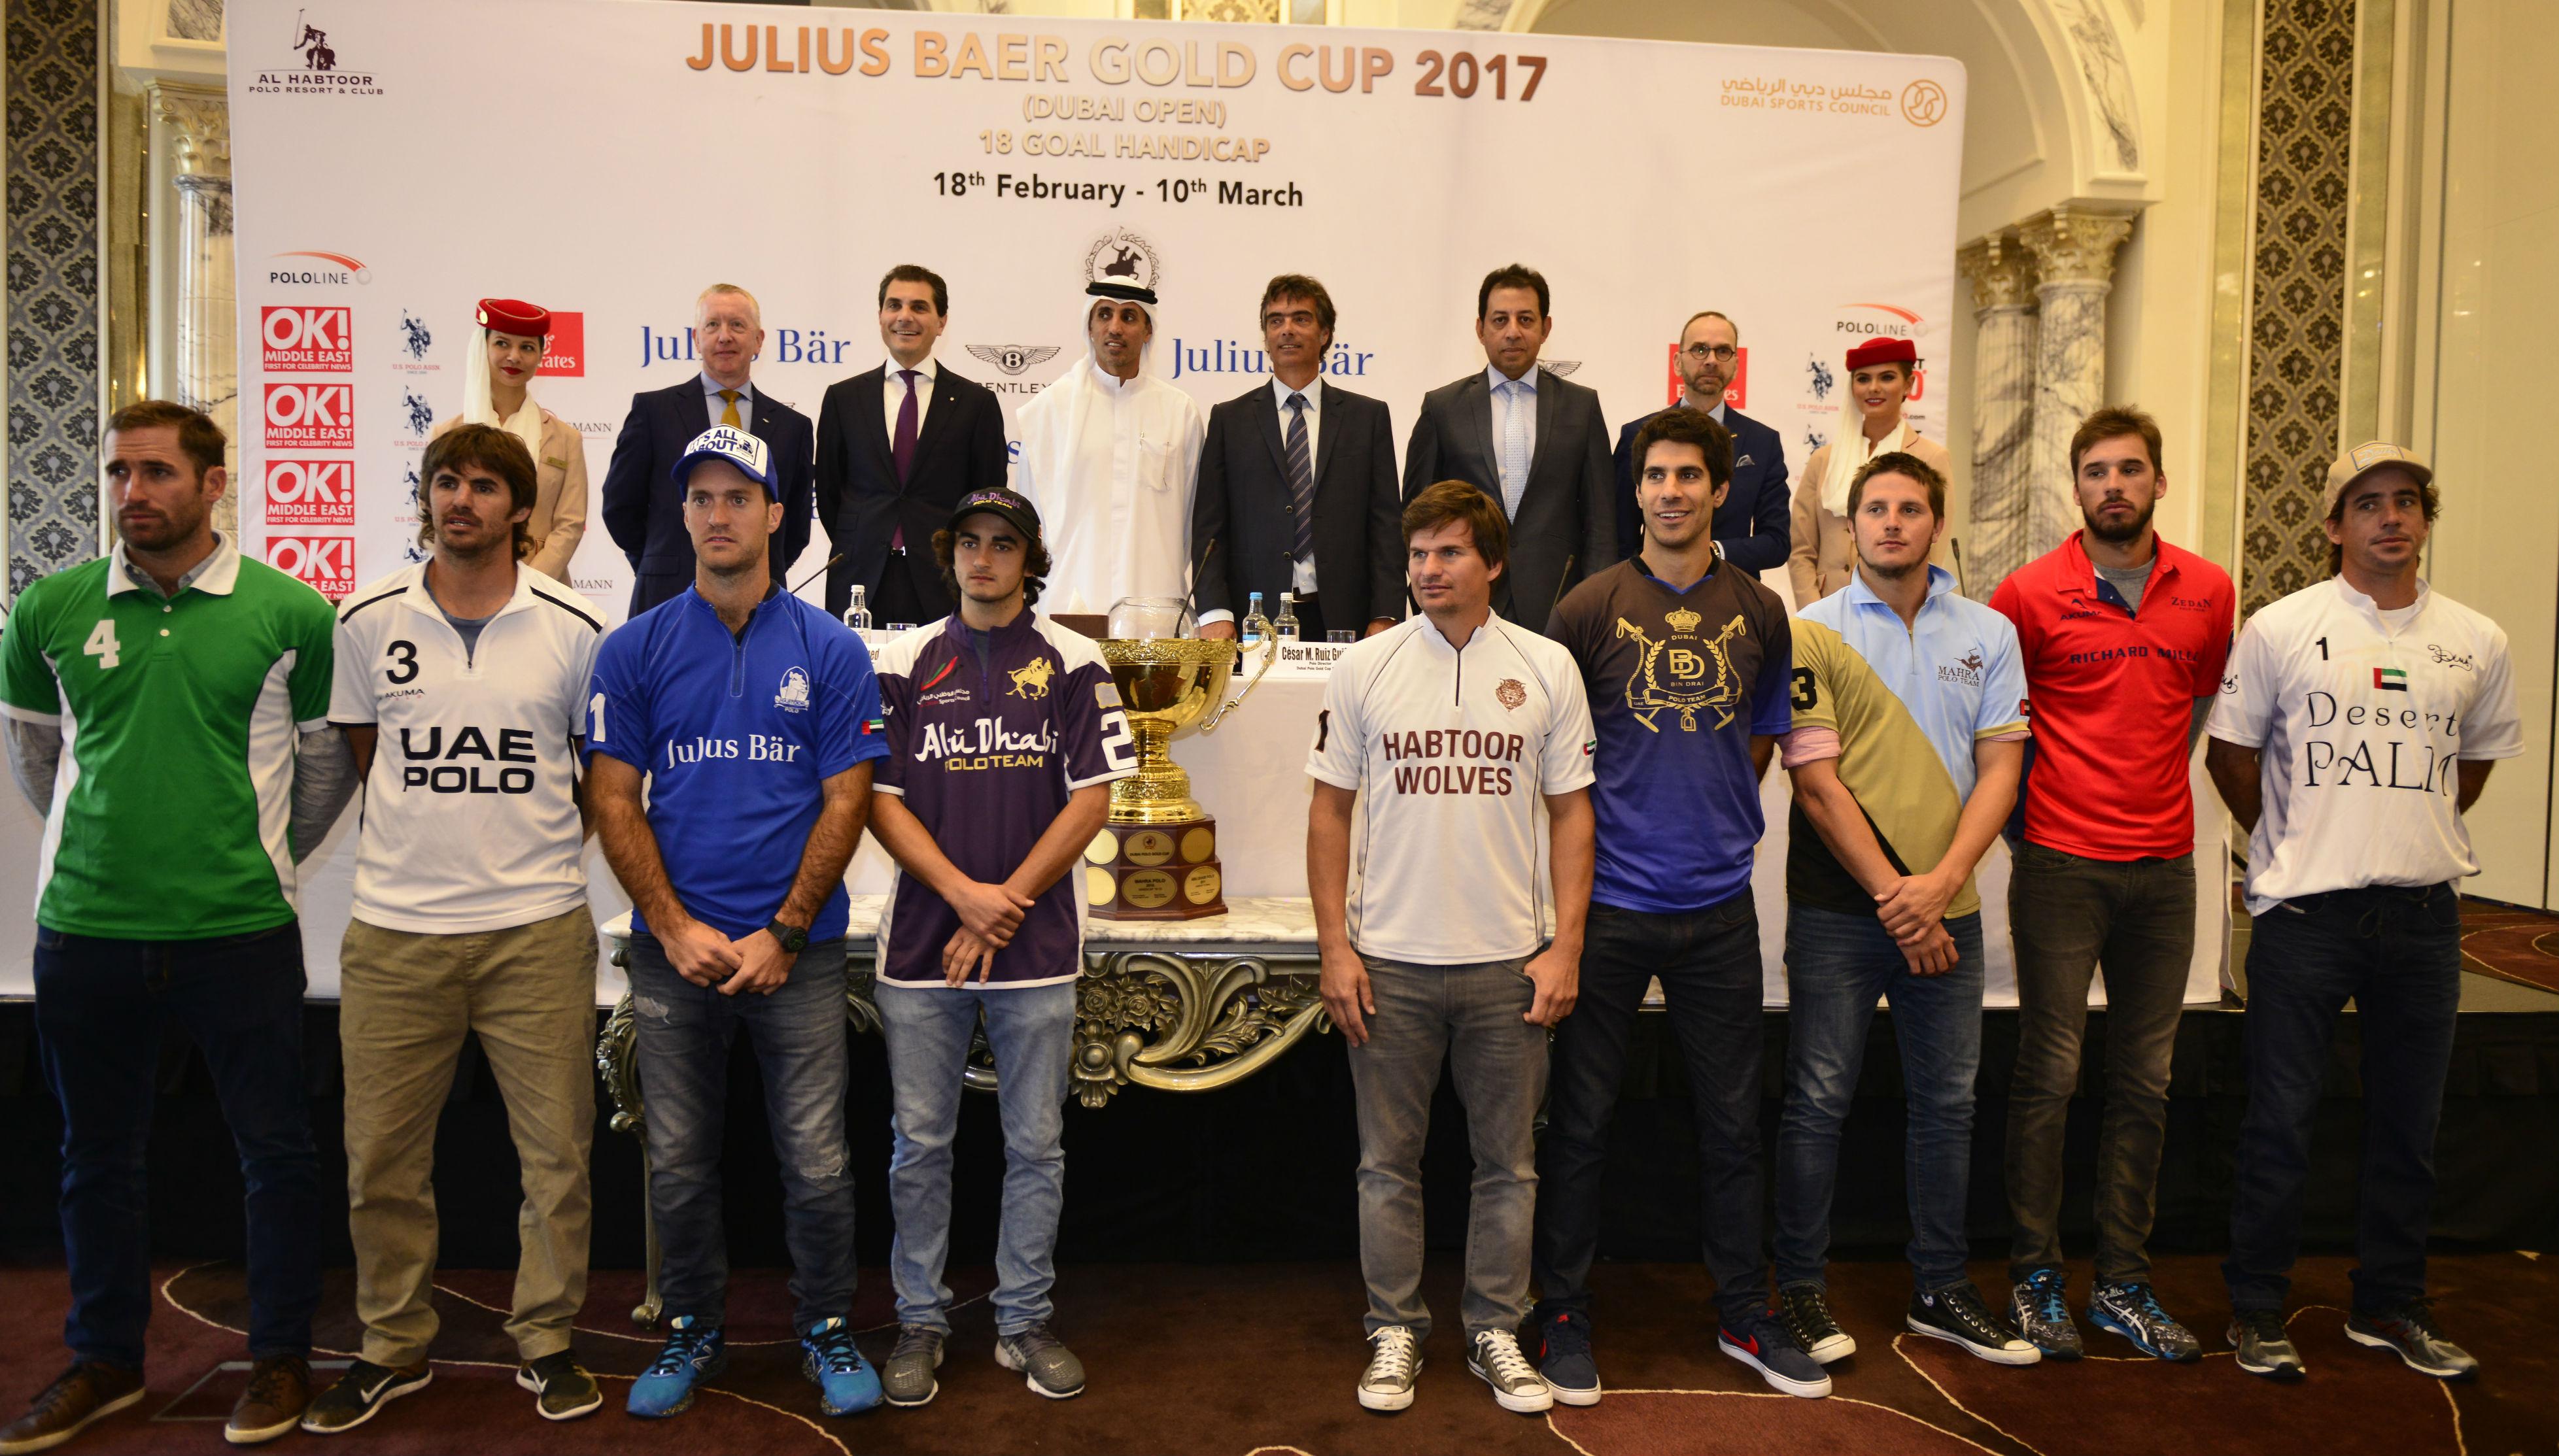 Julius Baer Gold Cup teams